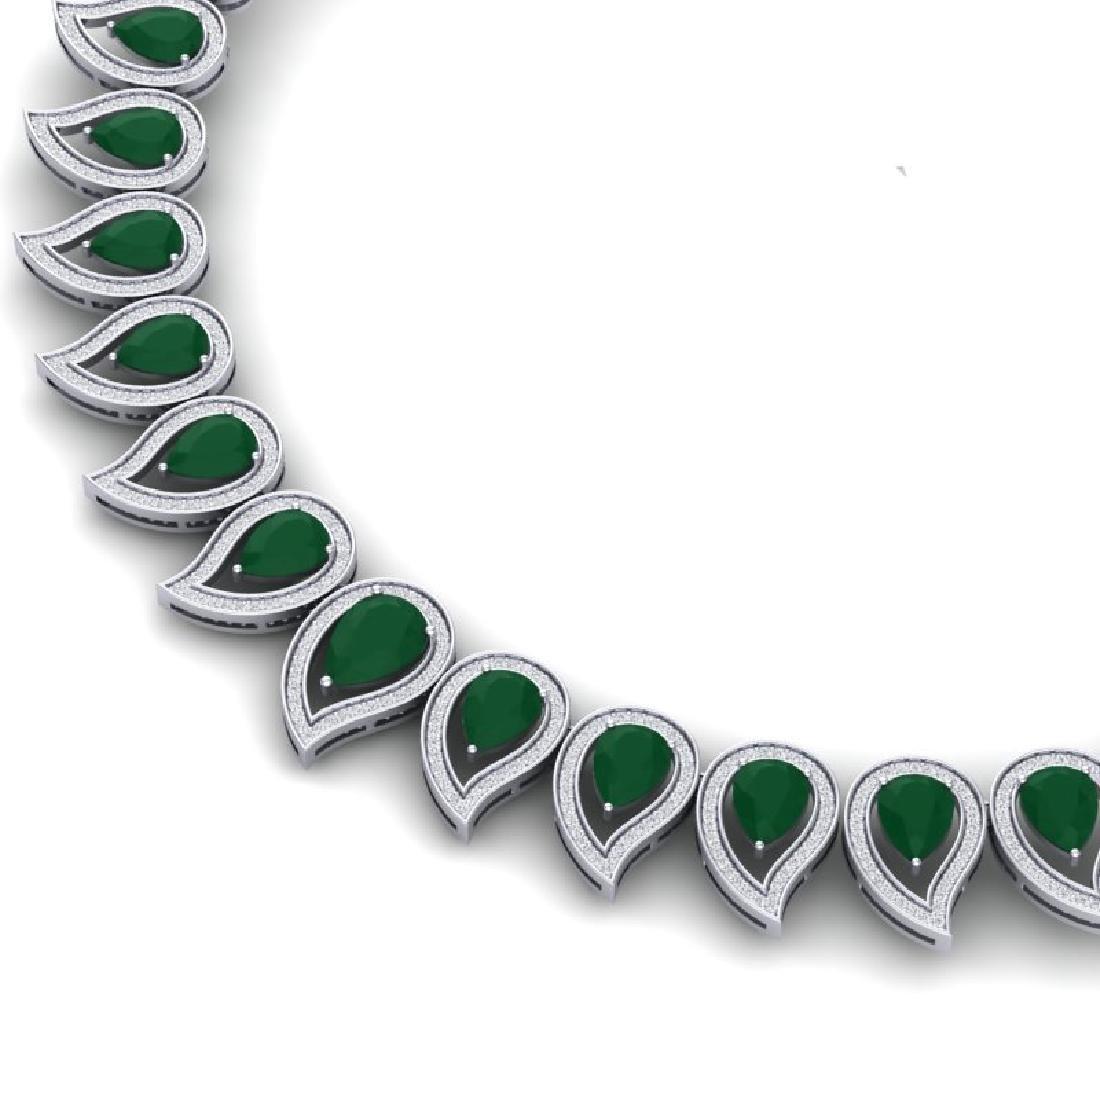 33.4 CTW Royalty Emerald & VS Diamond Necklace 18K Gold - 2